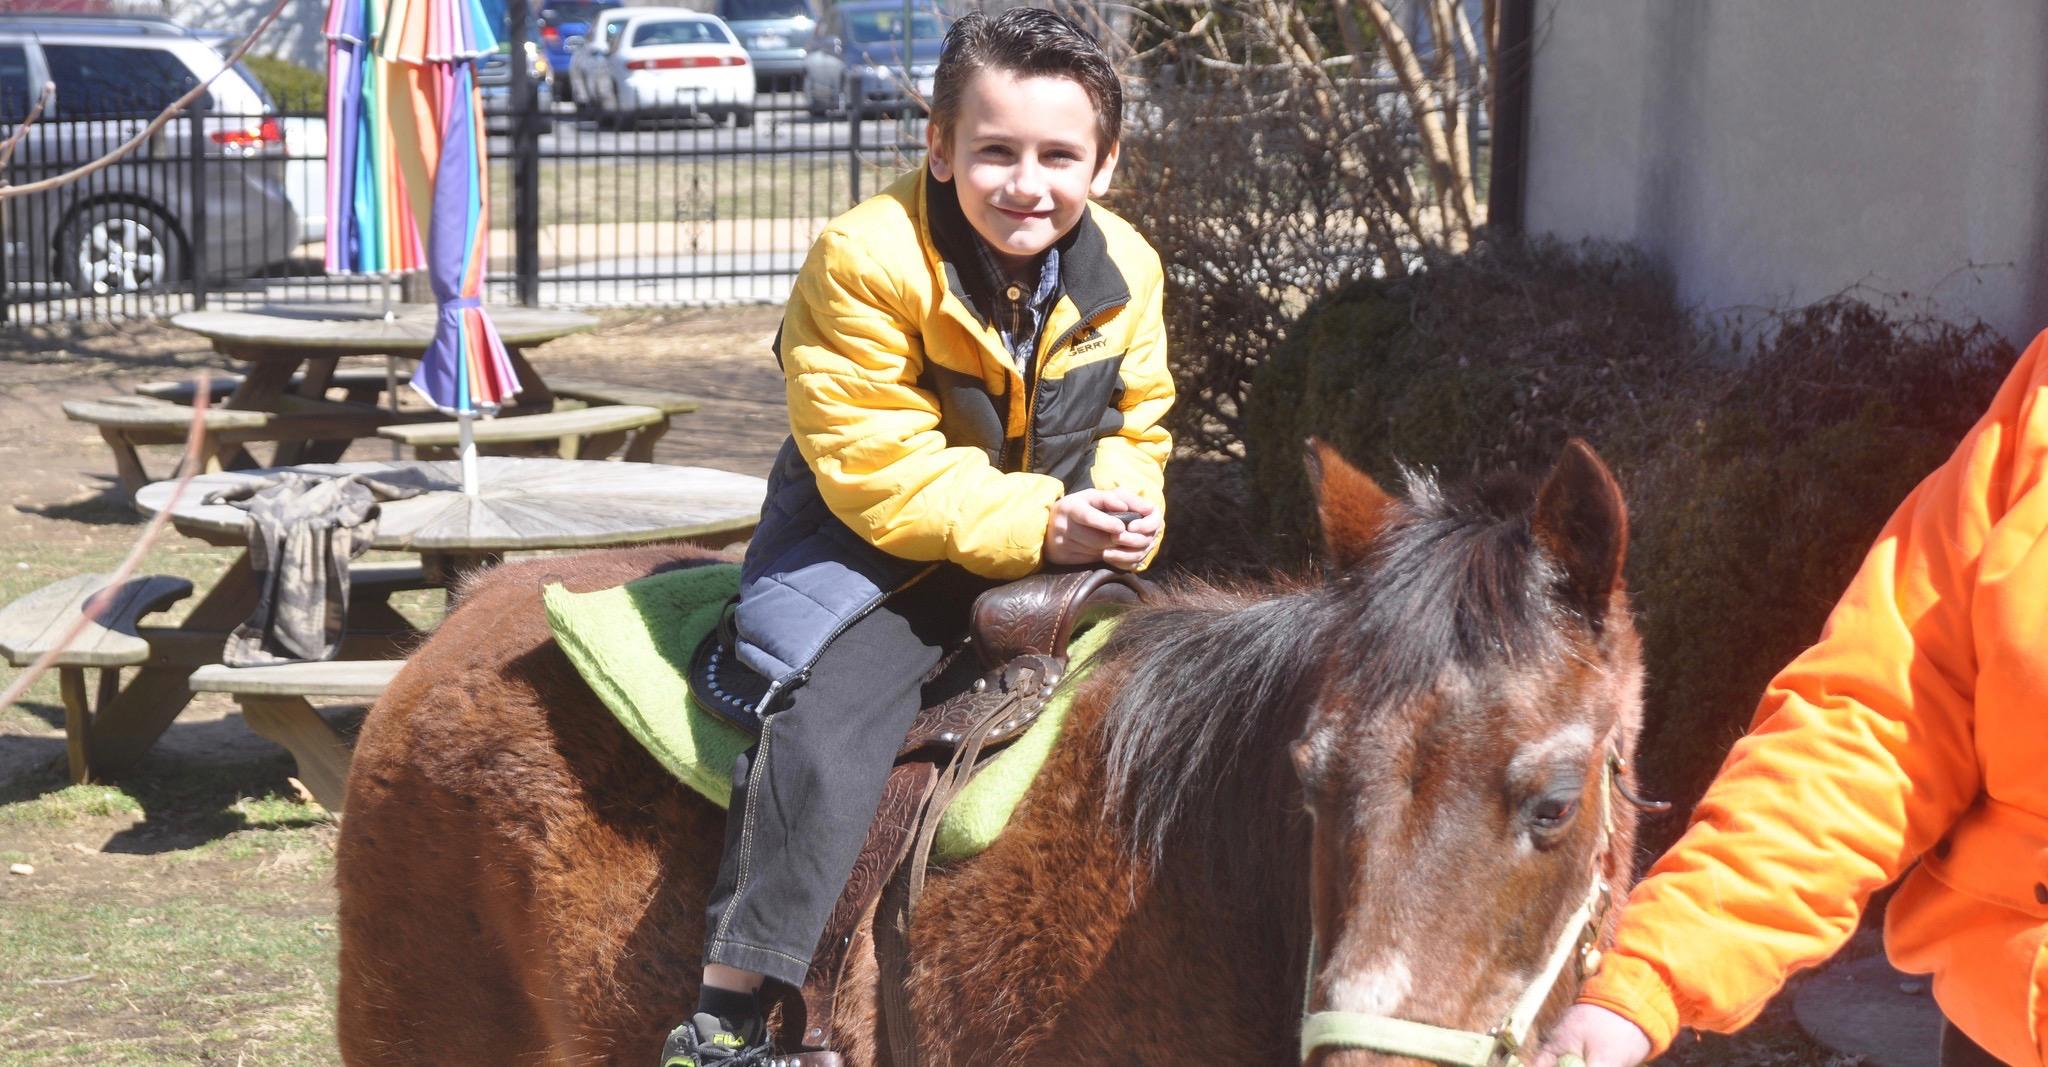 Boy on brown donkey